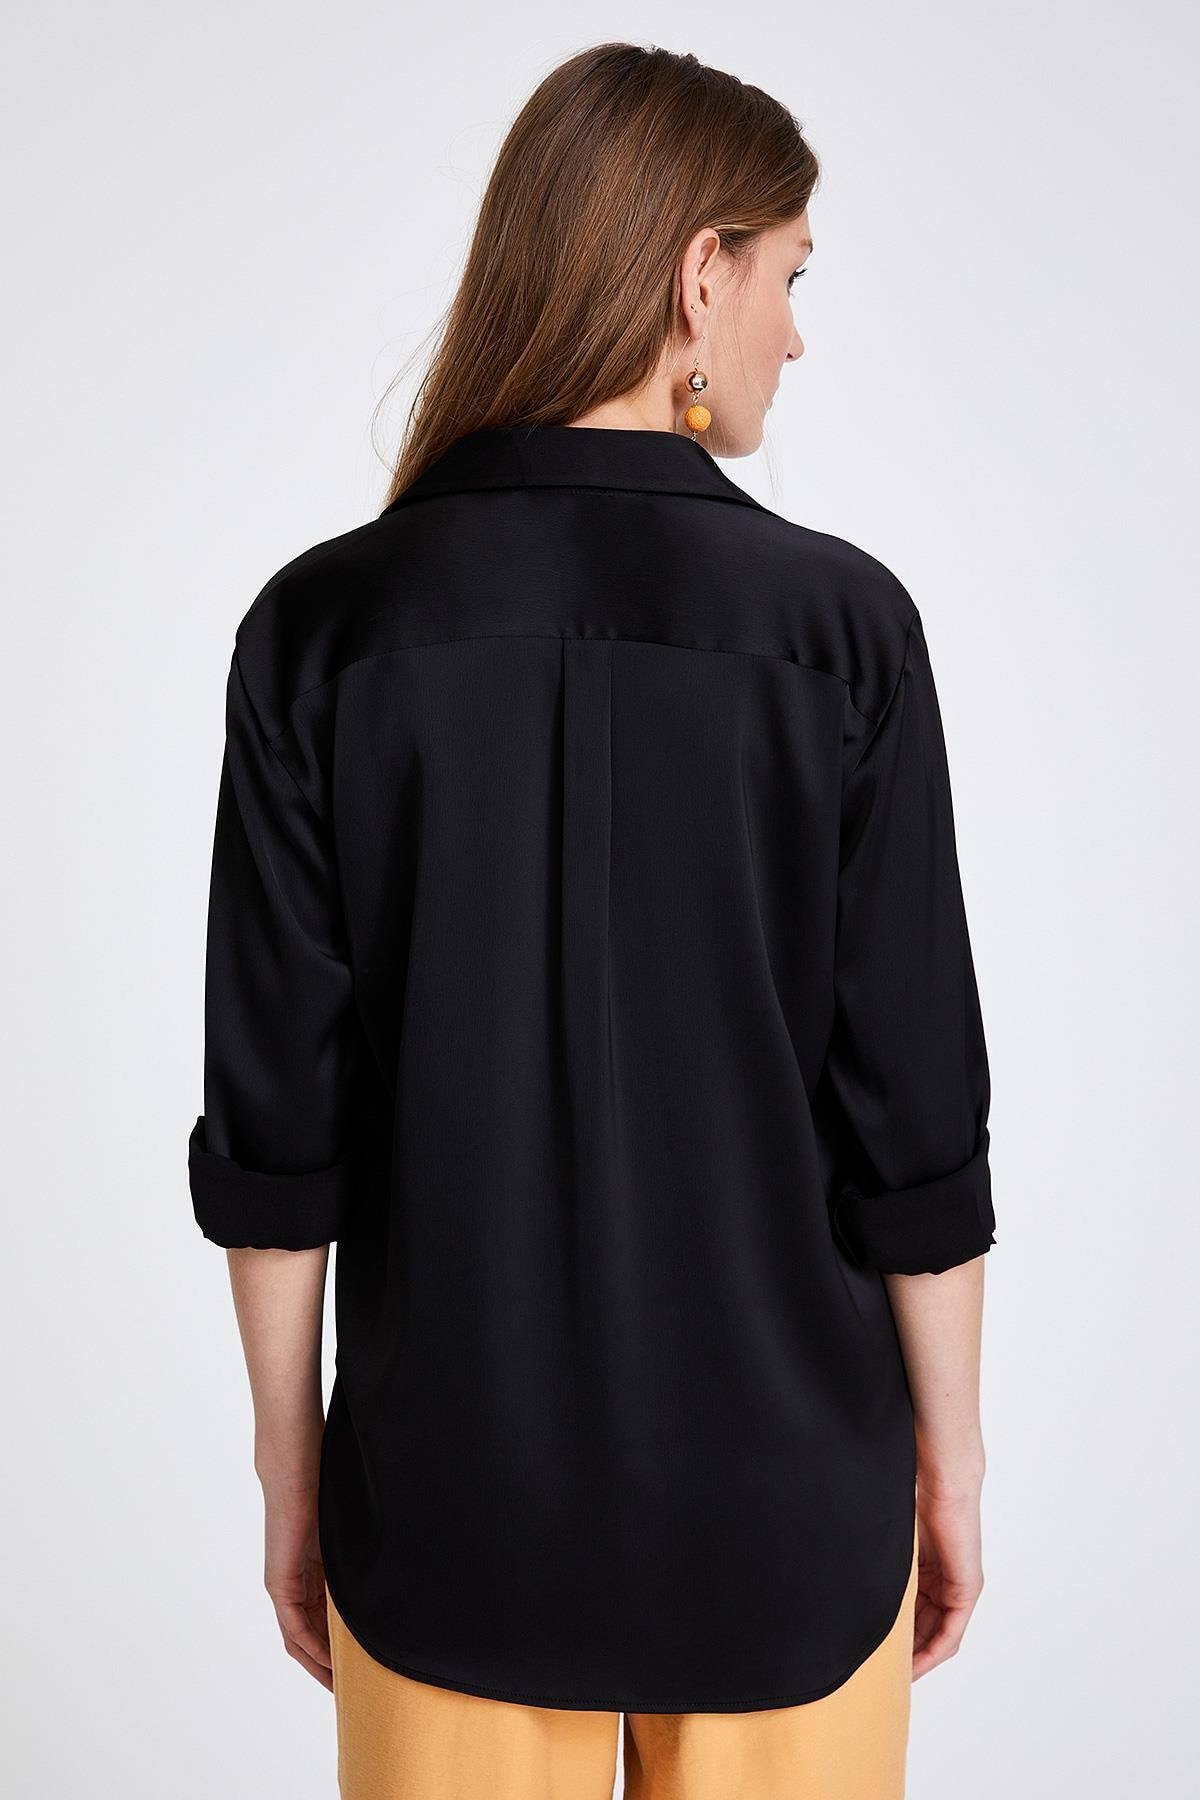 STELLA PULVIS Kadın Siyah Saten Gömlek 2